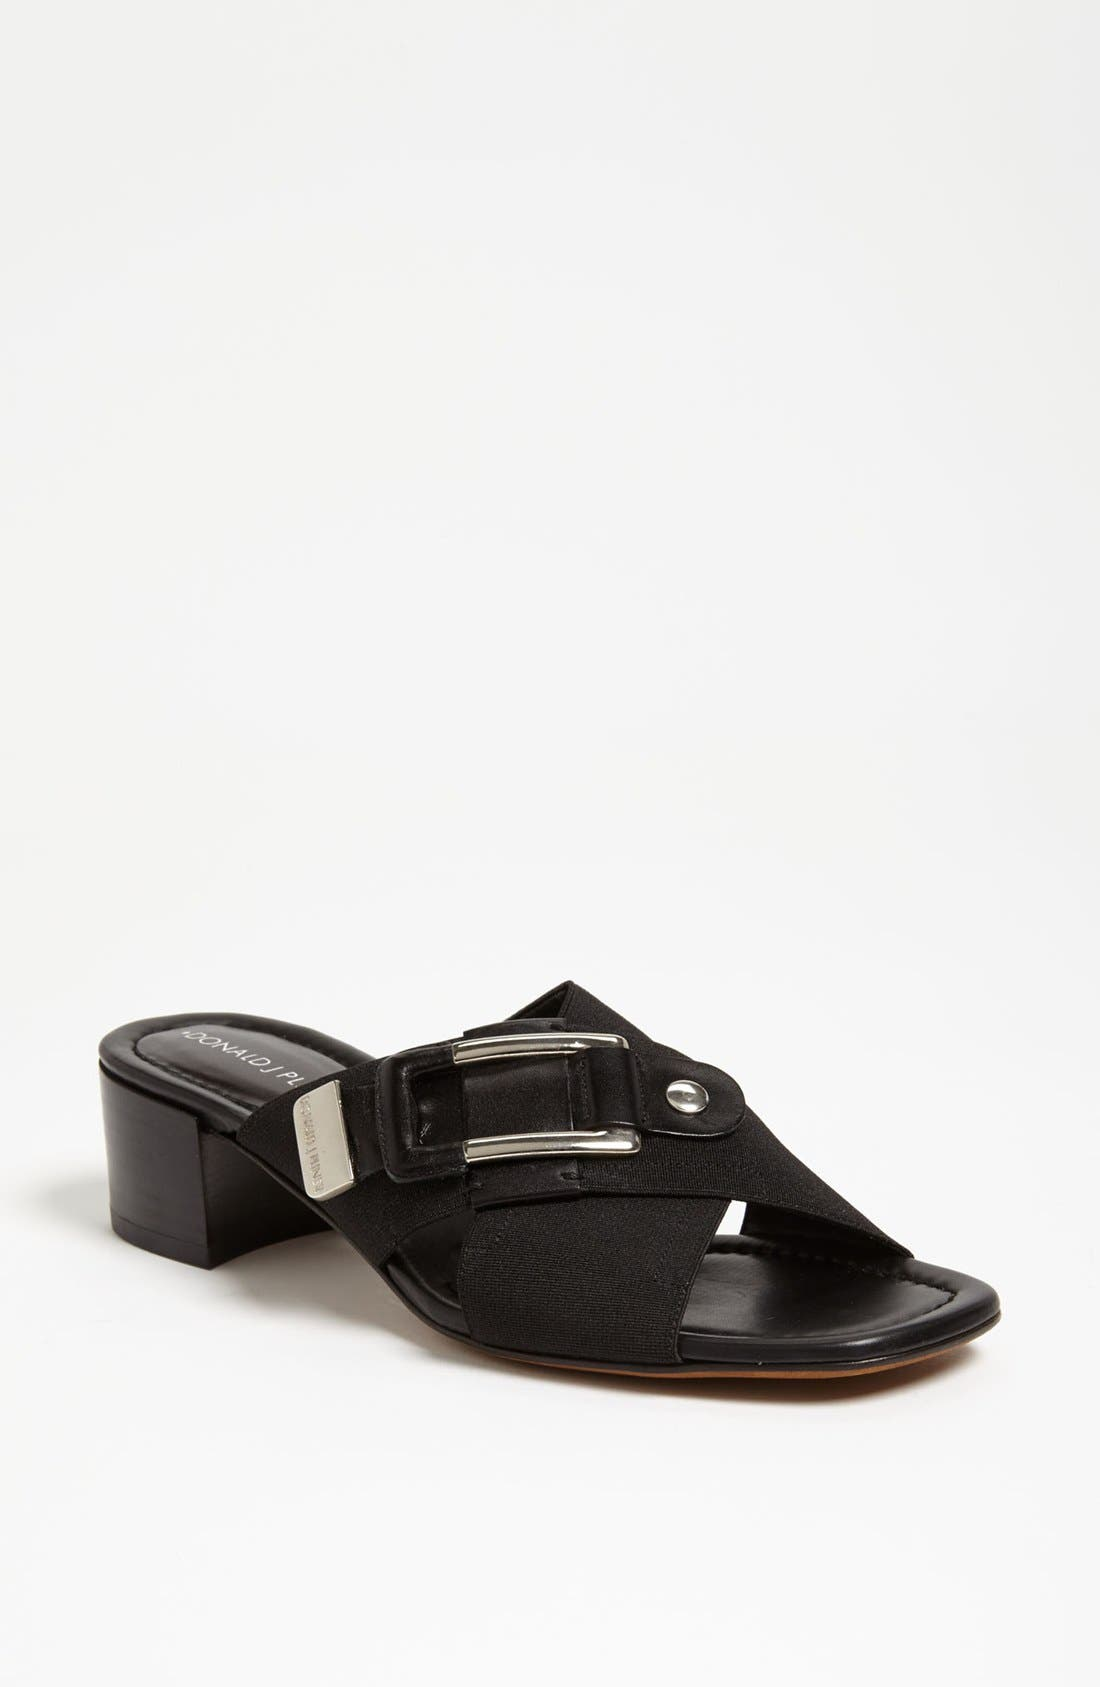 Alternate Image 1 Selected - Donald J Pliner 'Janice' Sandal